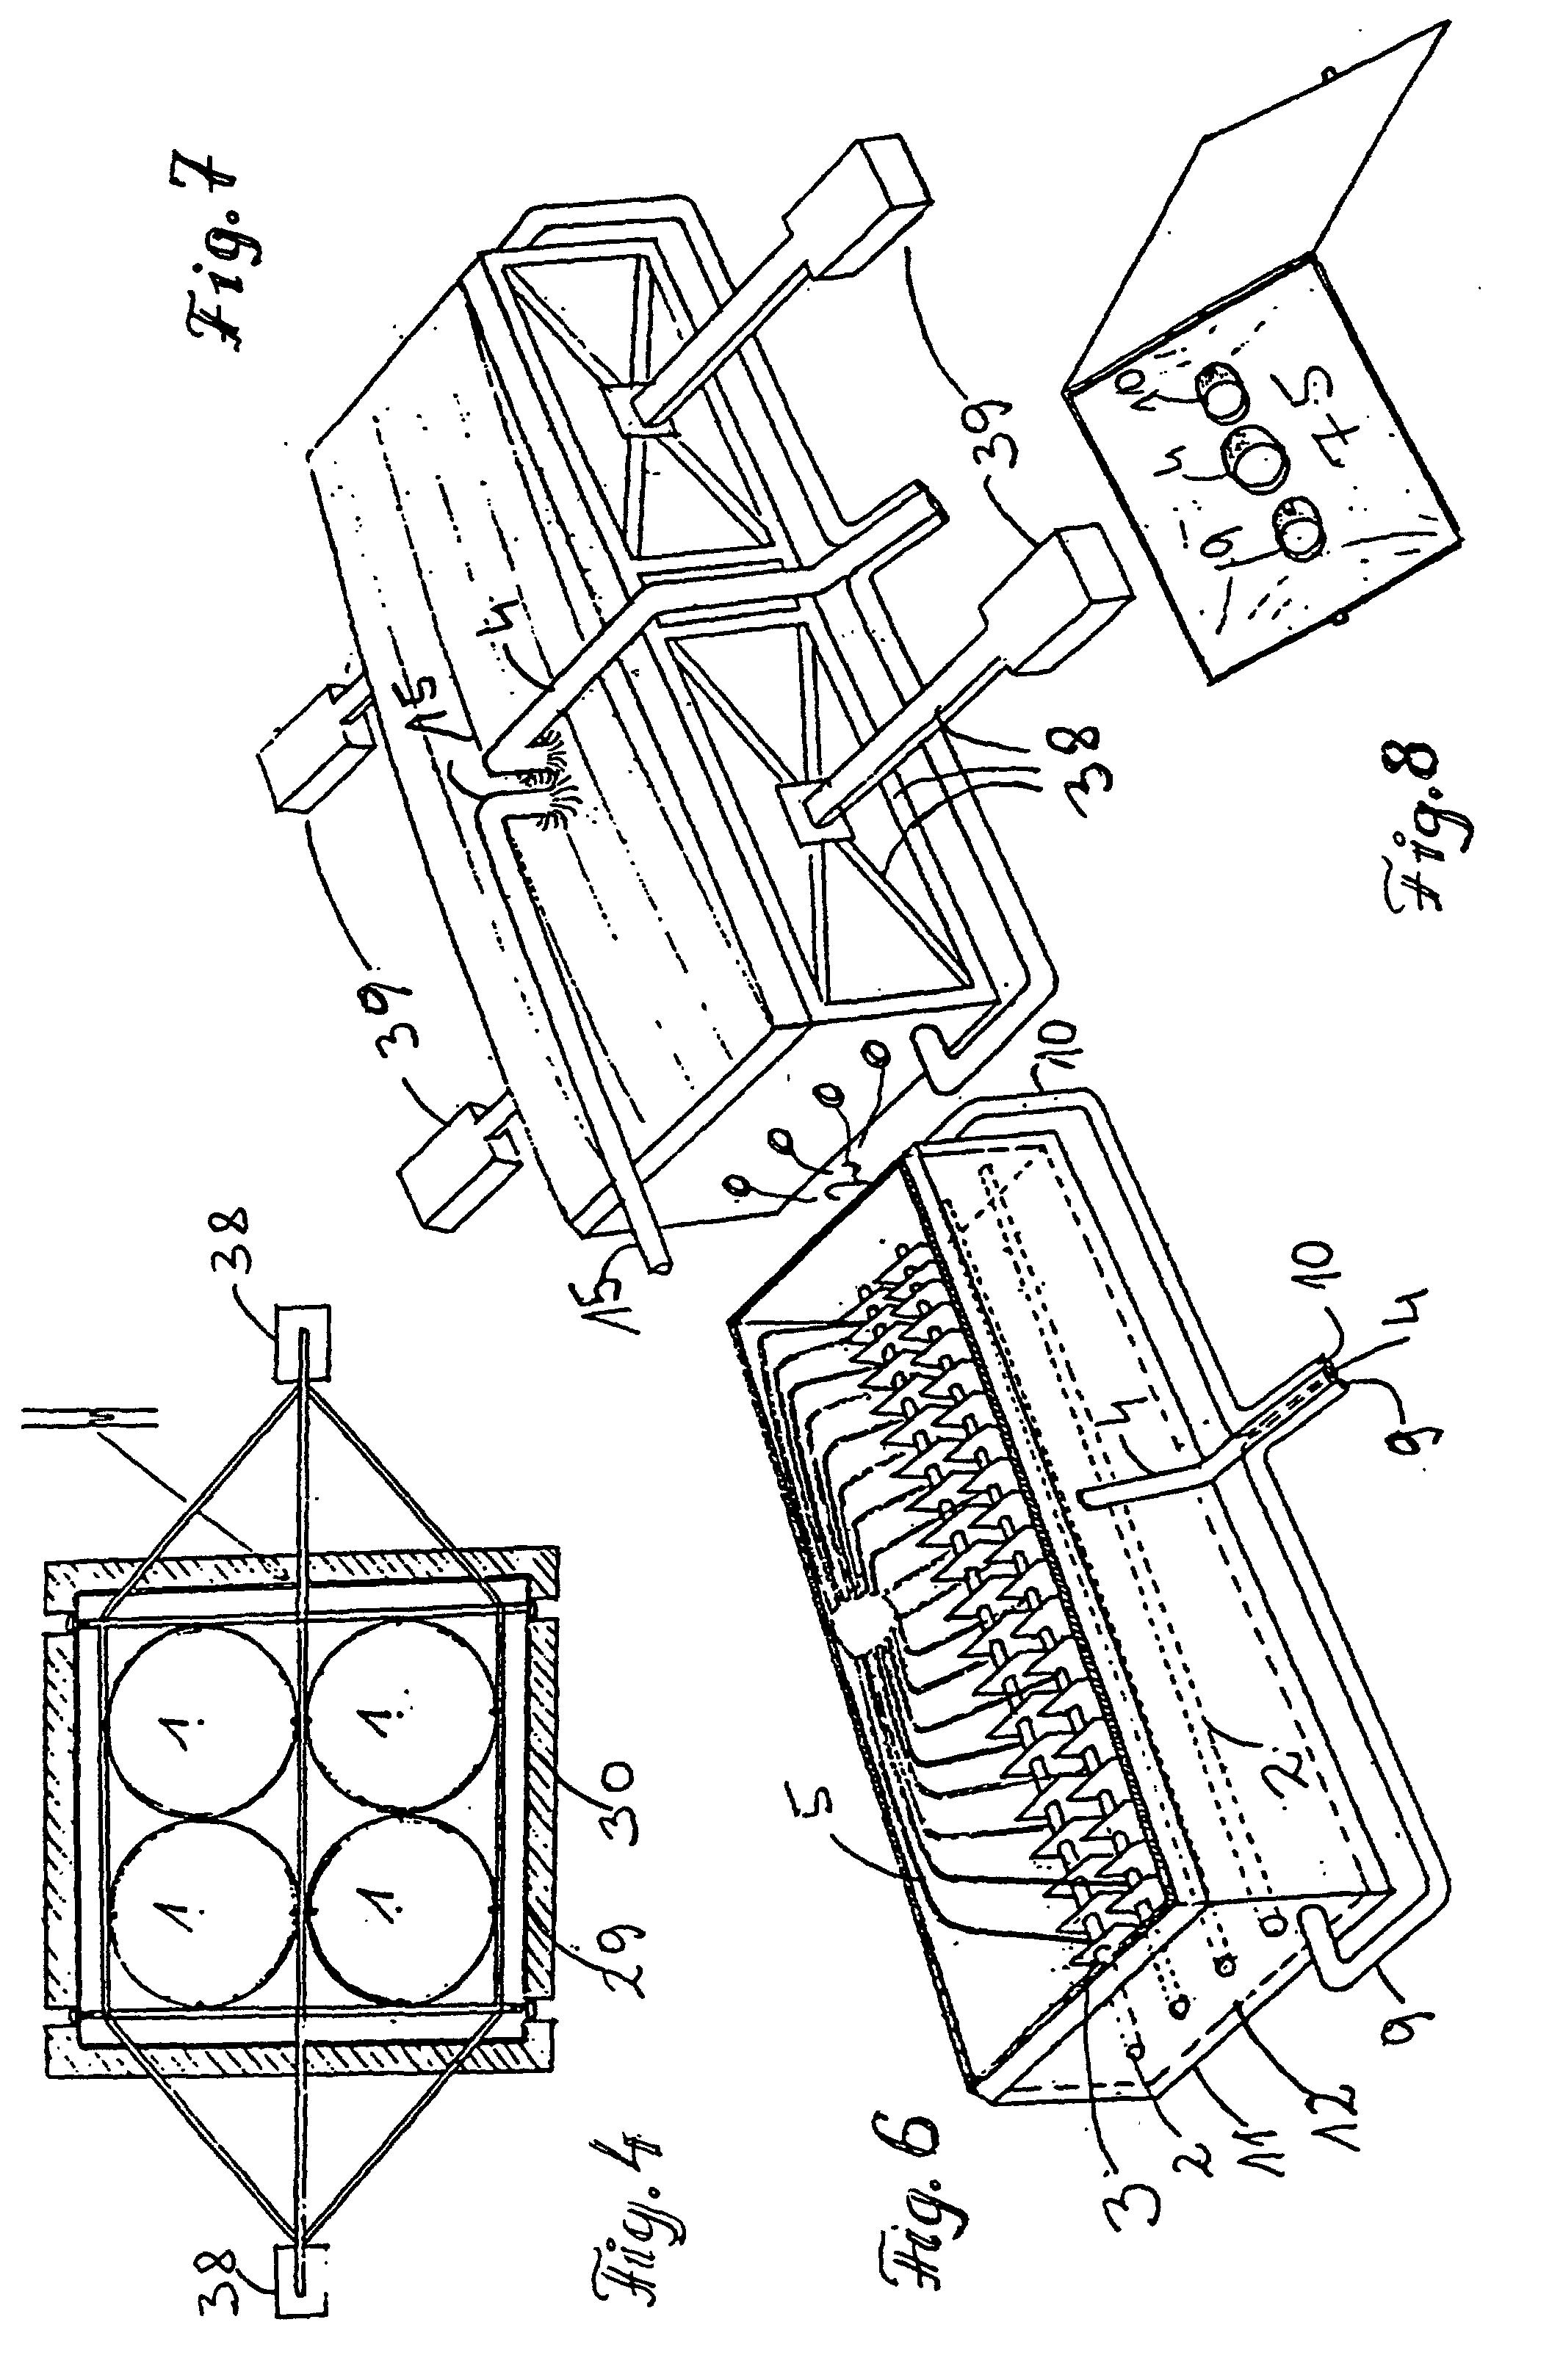 Patent EP B1 Steam generator and steam turbine driving